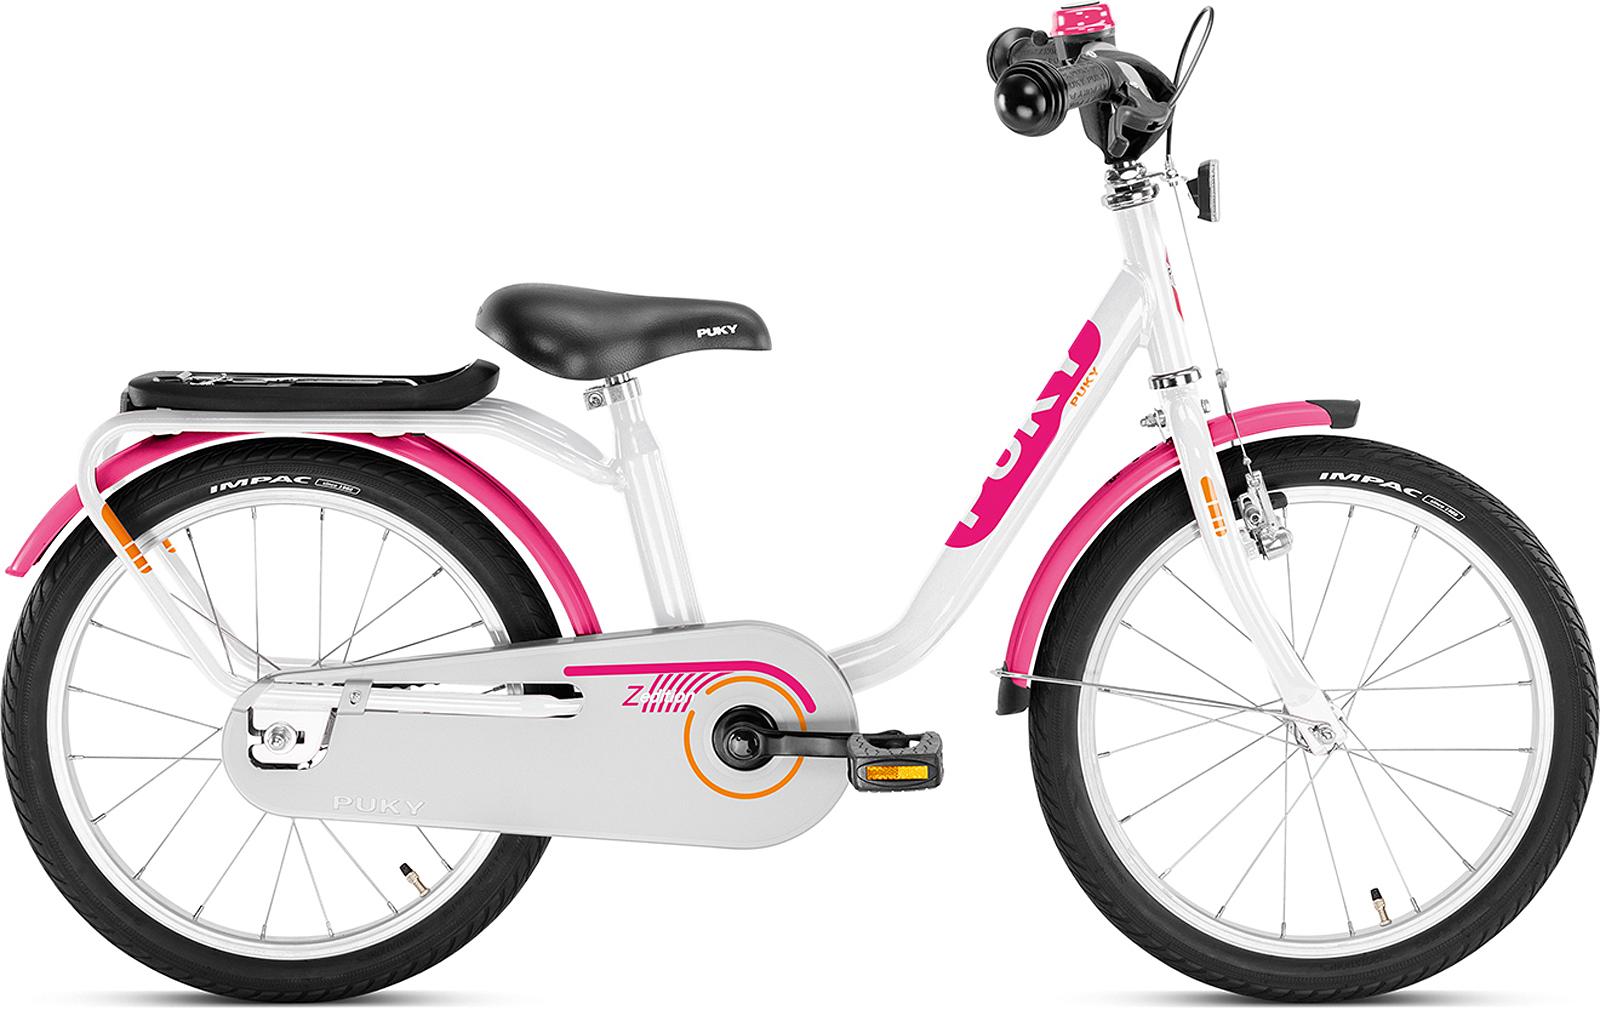 puky z 8 edition kinder fahrrad wei pink von top marken. Black Bedroom Furniture Sets. Home Design Ideas